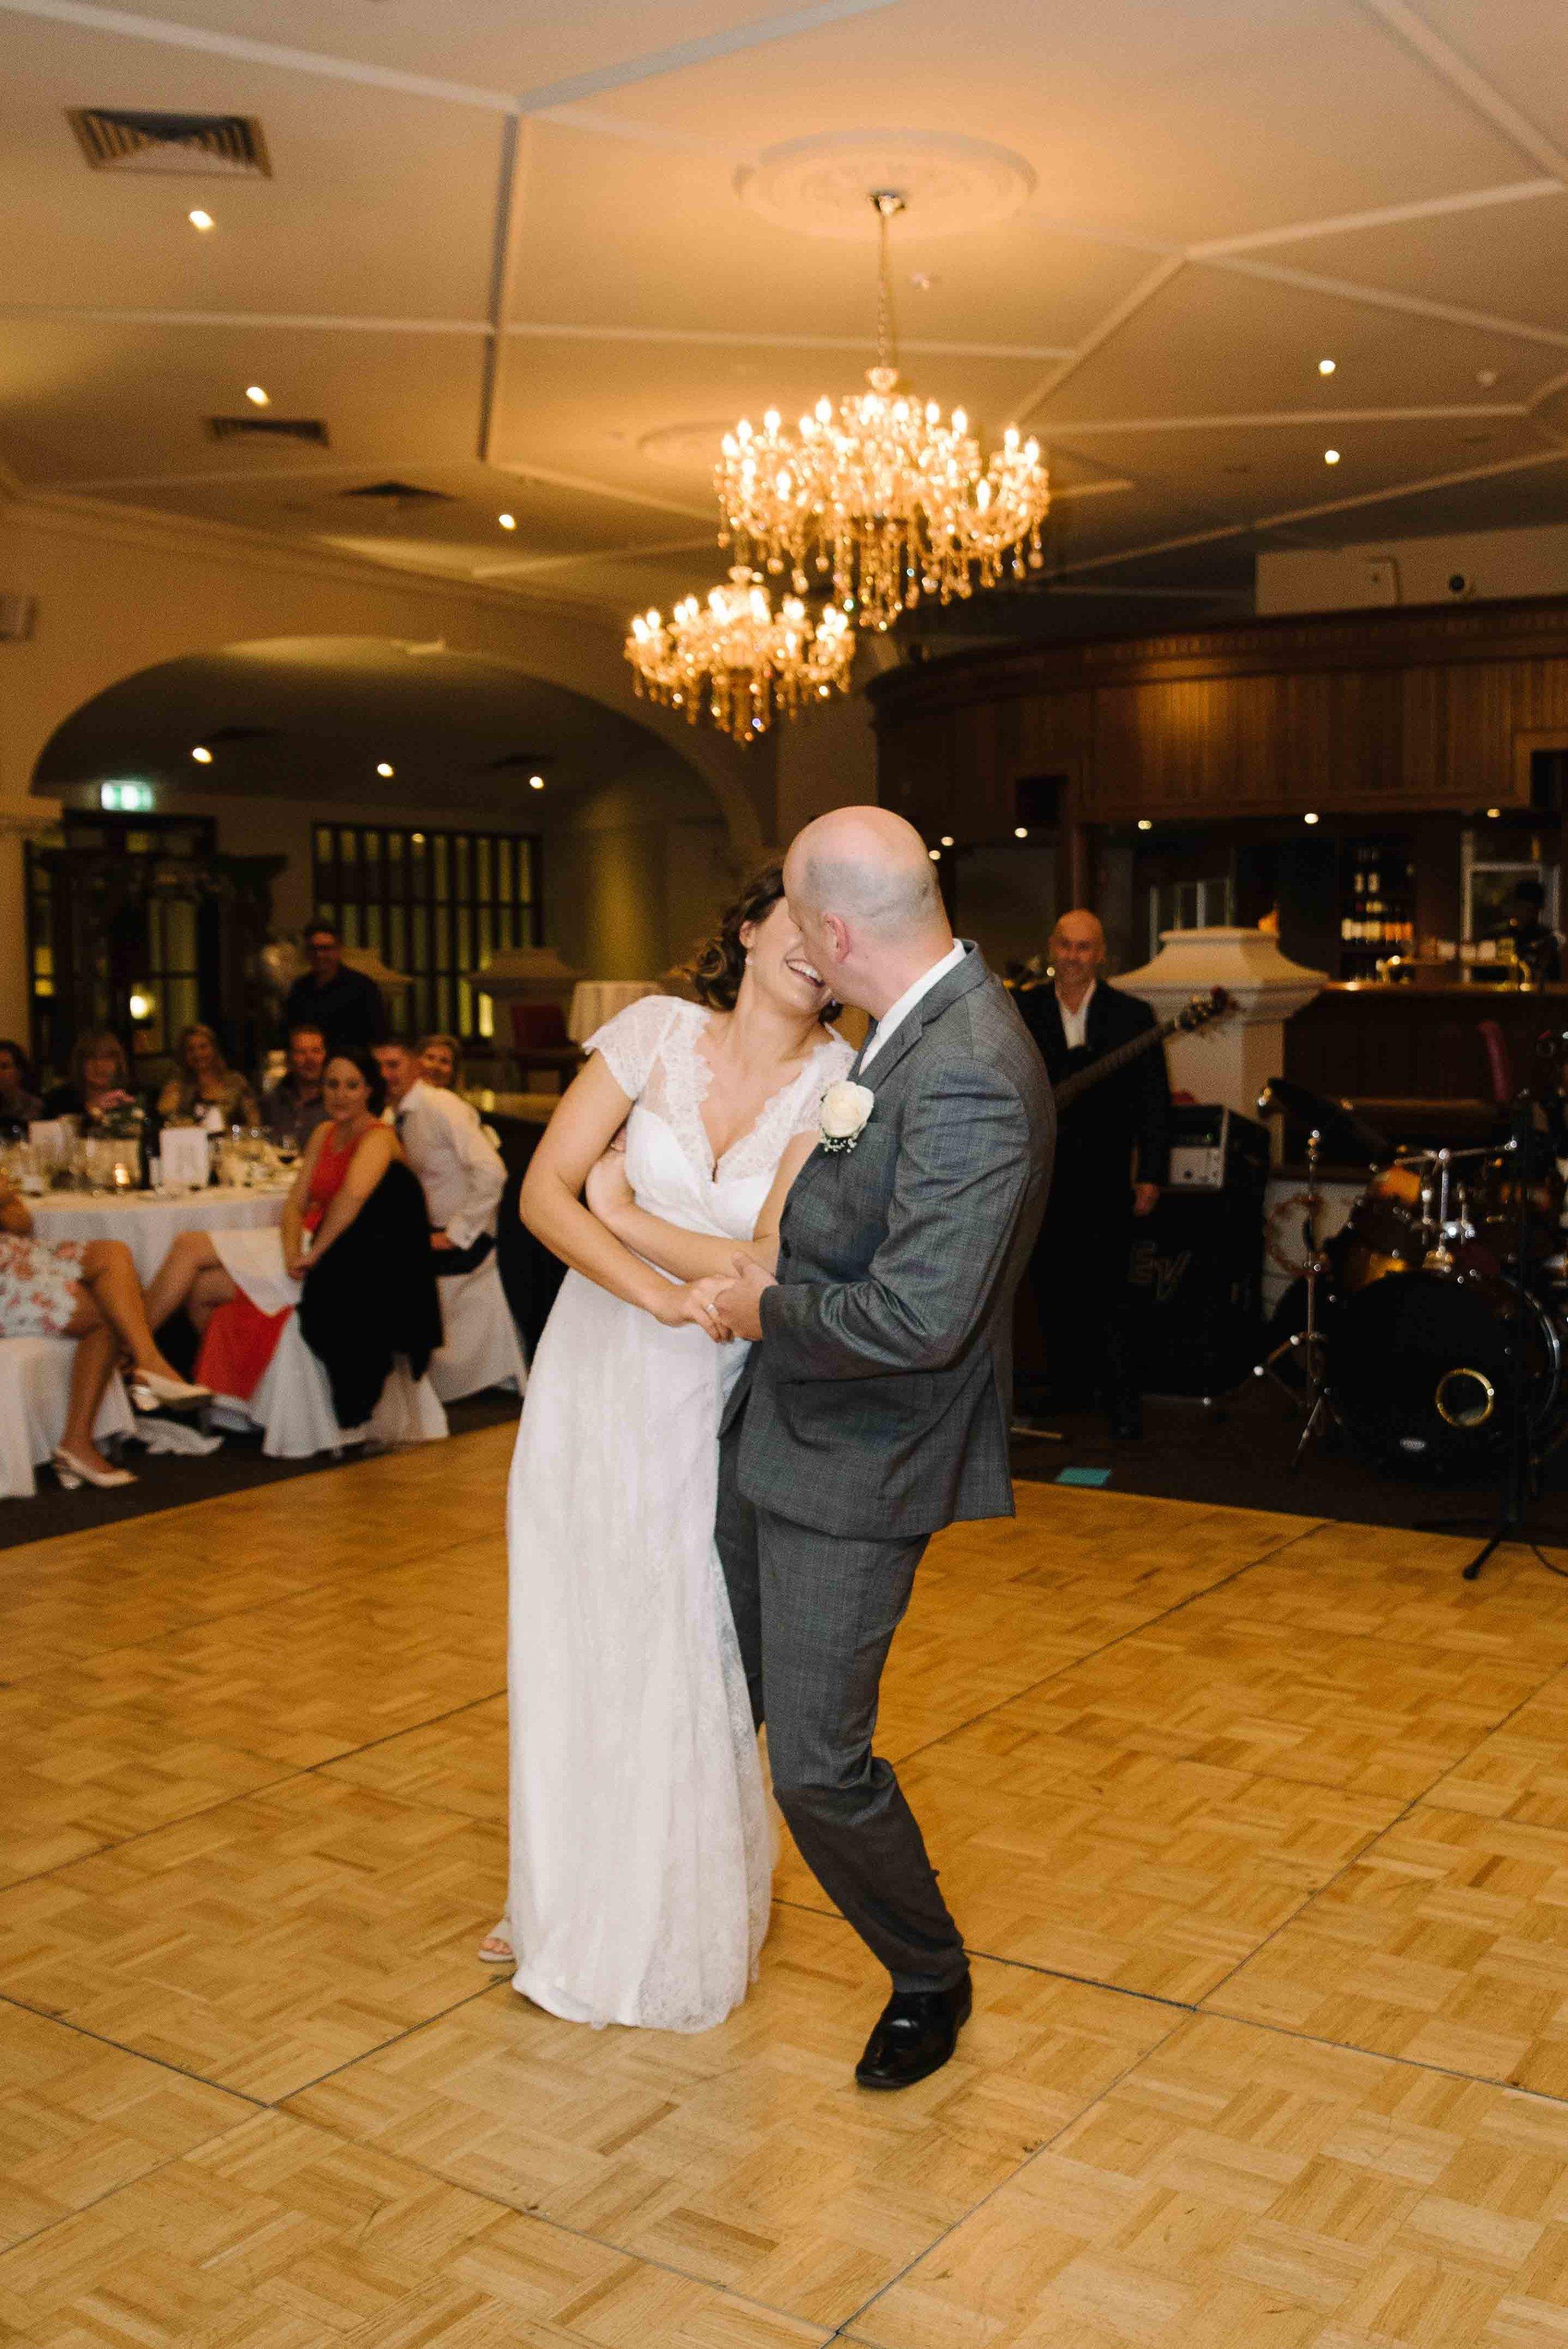 79-dance floor wedding venue como.jpg